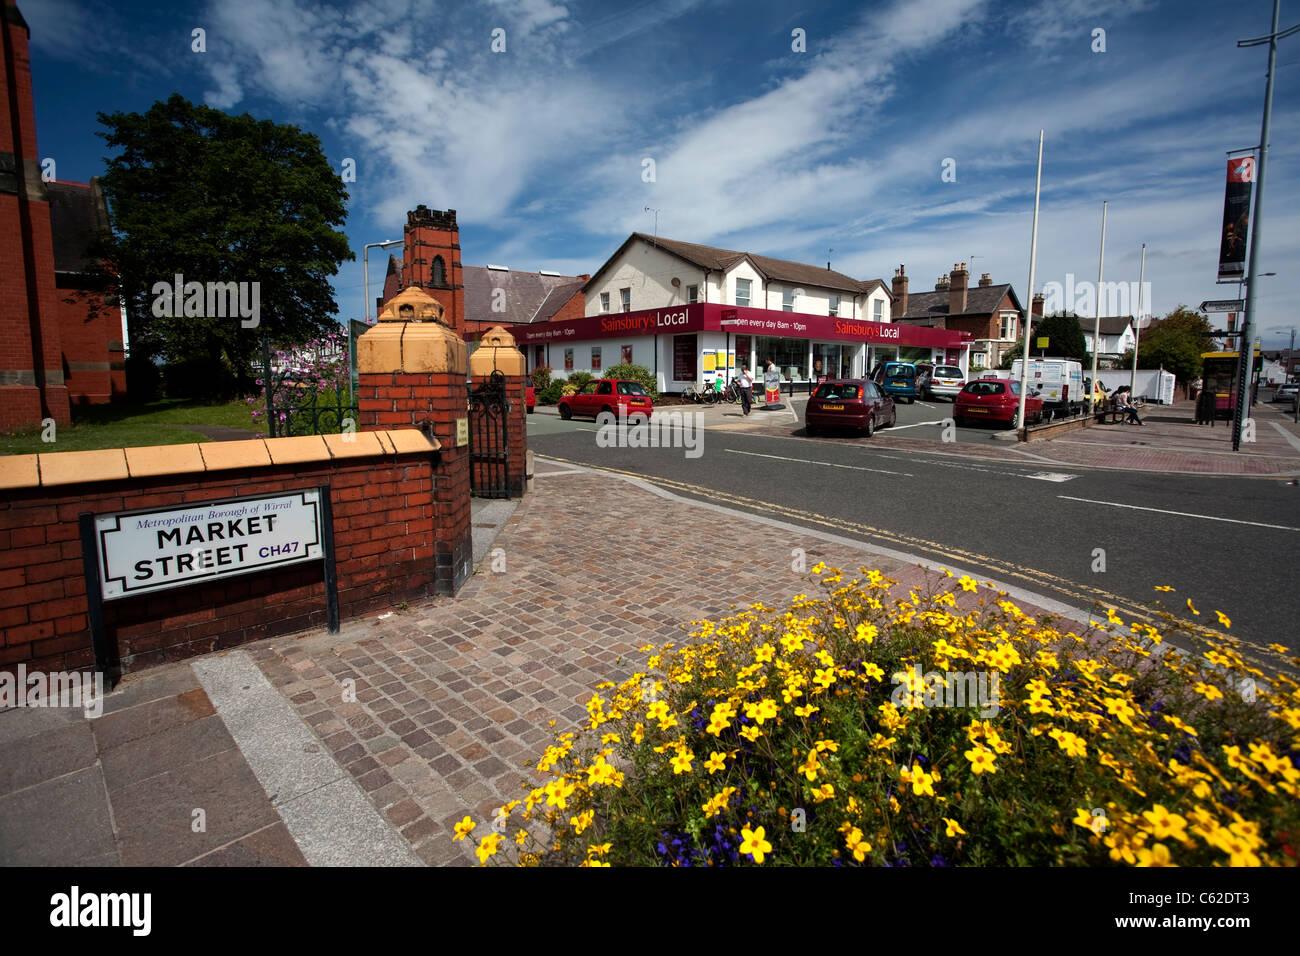 Market Street, Hoylake, Wirral, NW UK showing the corner of St Luke's Methodist Church and the small Sainsbury's - Stock Image